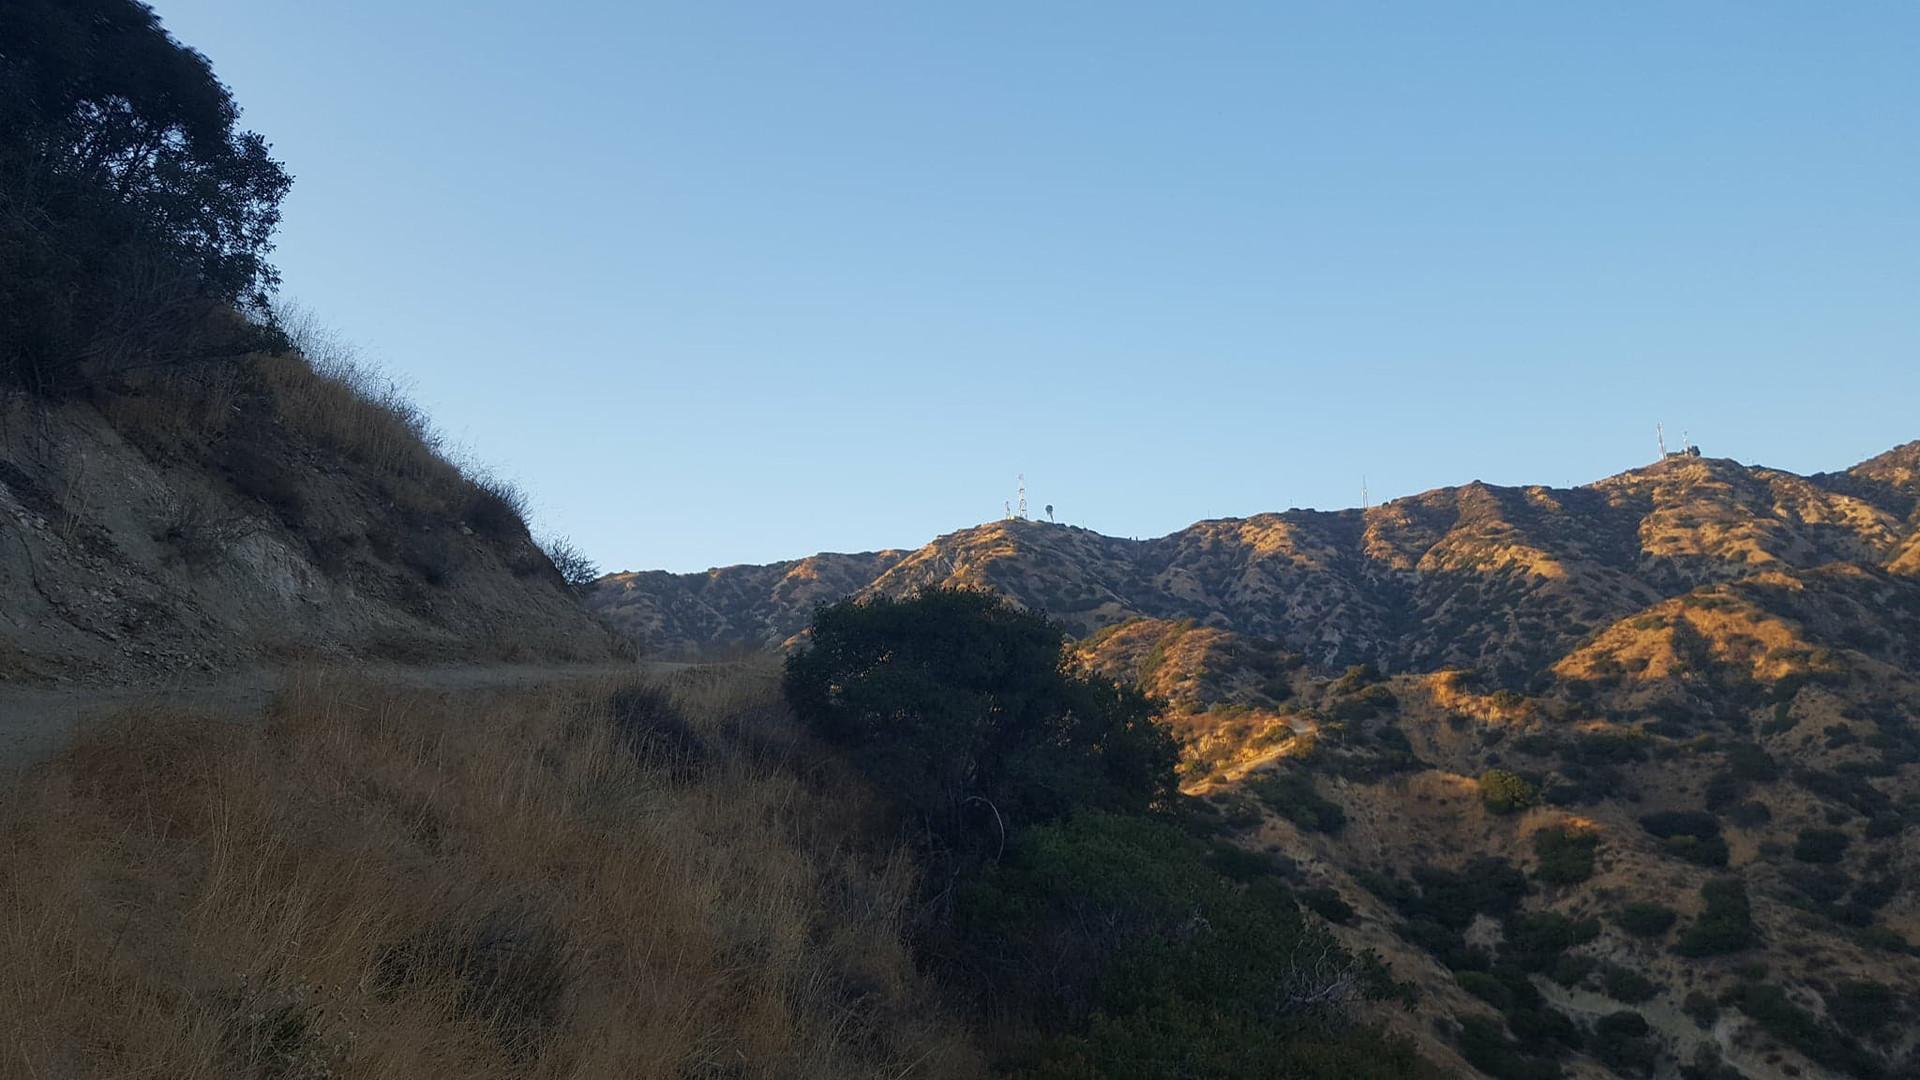 destination run wildwood canyon trail california jamey srock 1